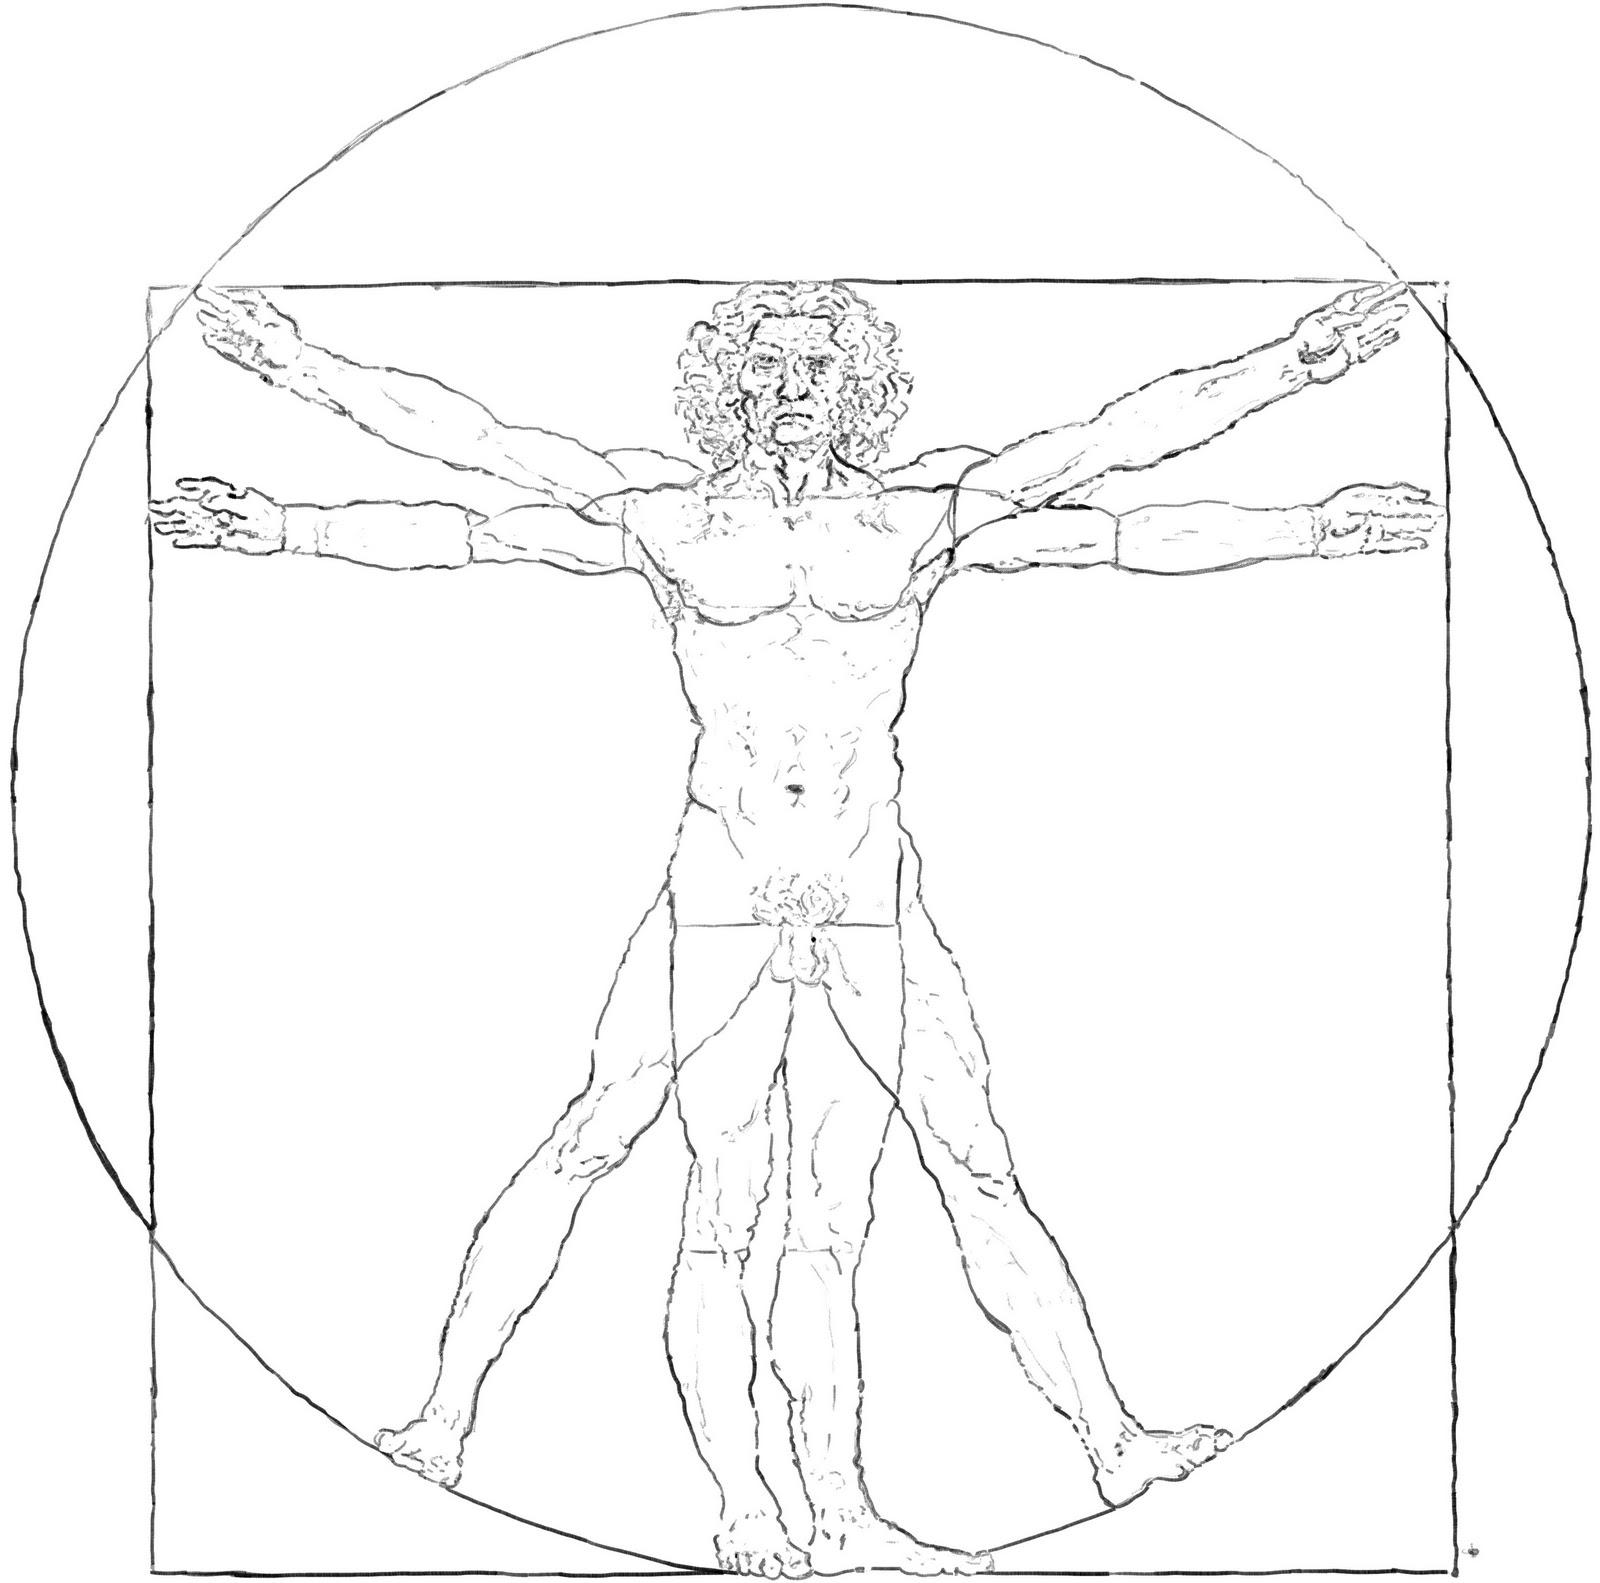 Todd Allison Illustration: Assignment: Copy a Master - Vitruvian Man